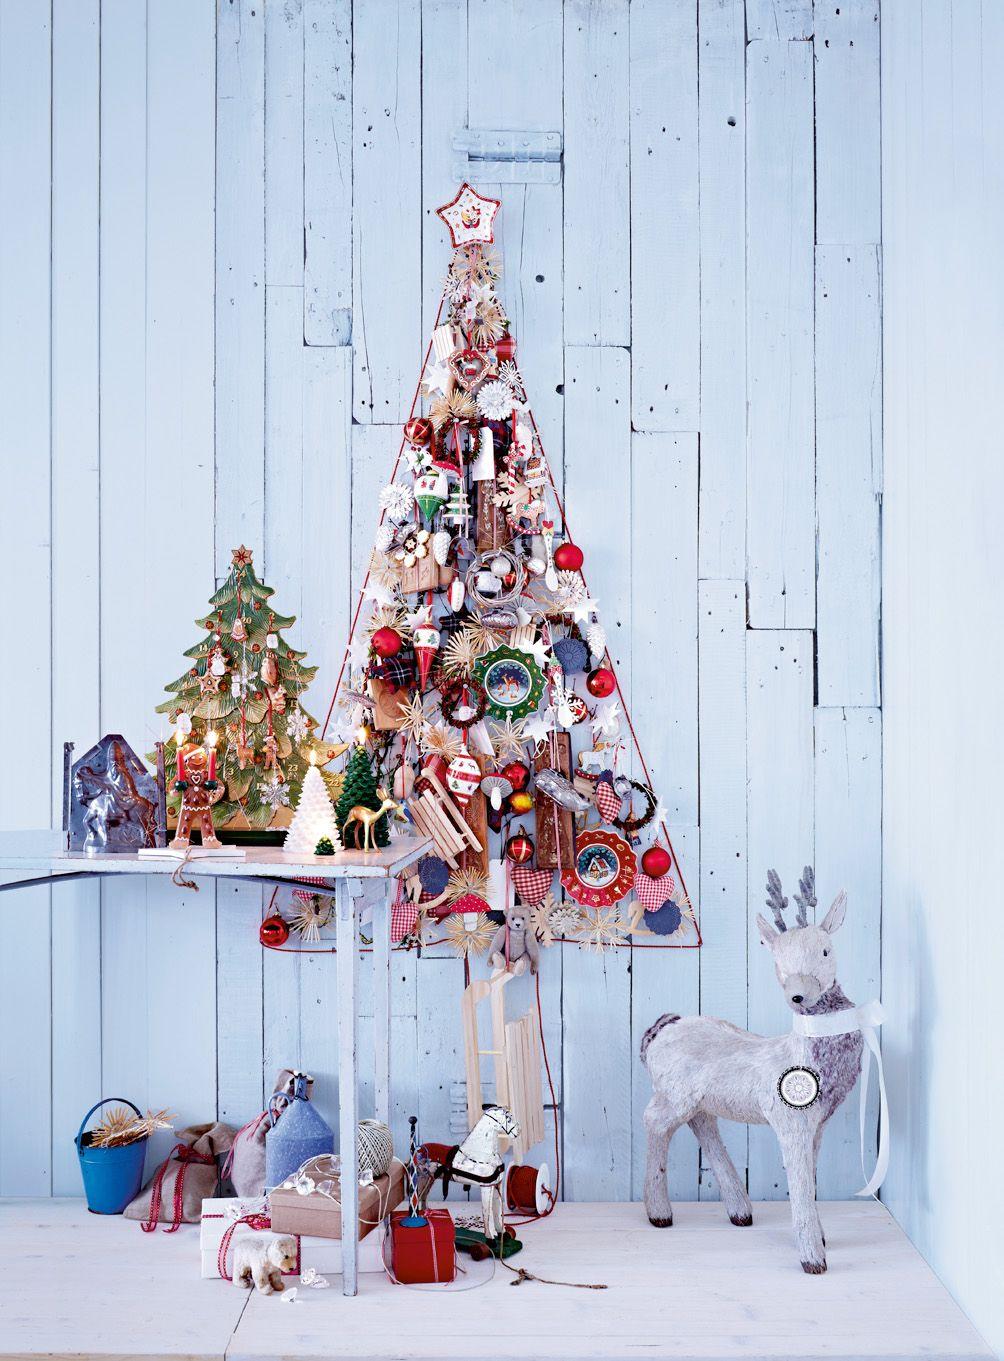 Weihnachten Tradition tradition gets a new look | c h r i s t m a s | weihnachten